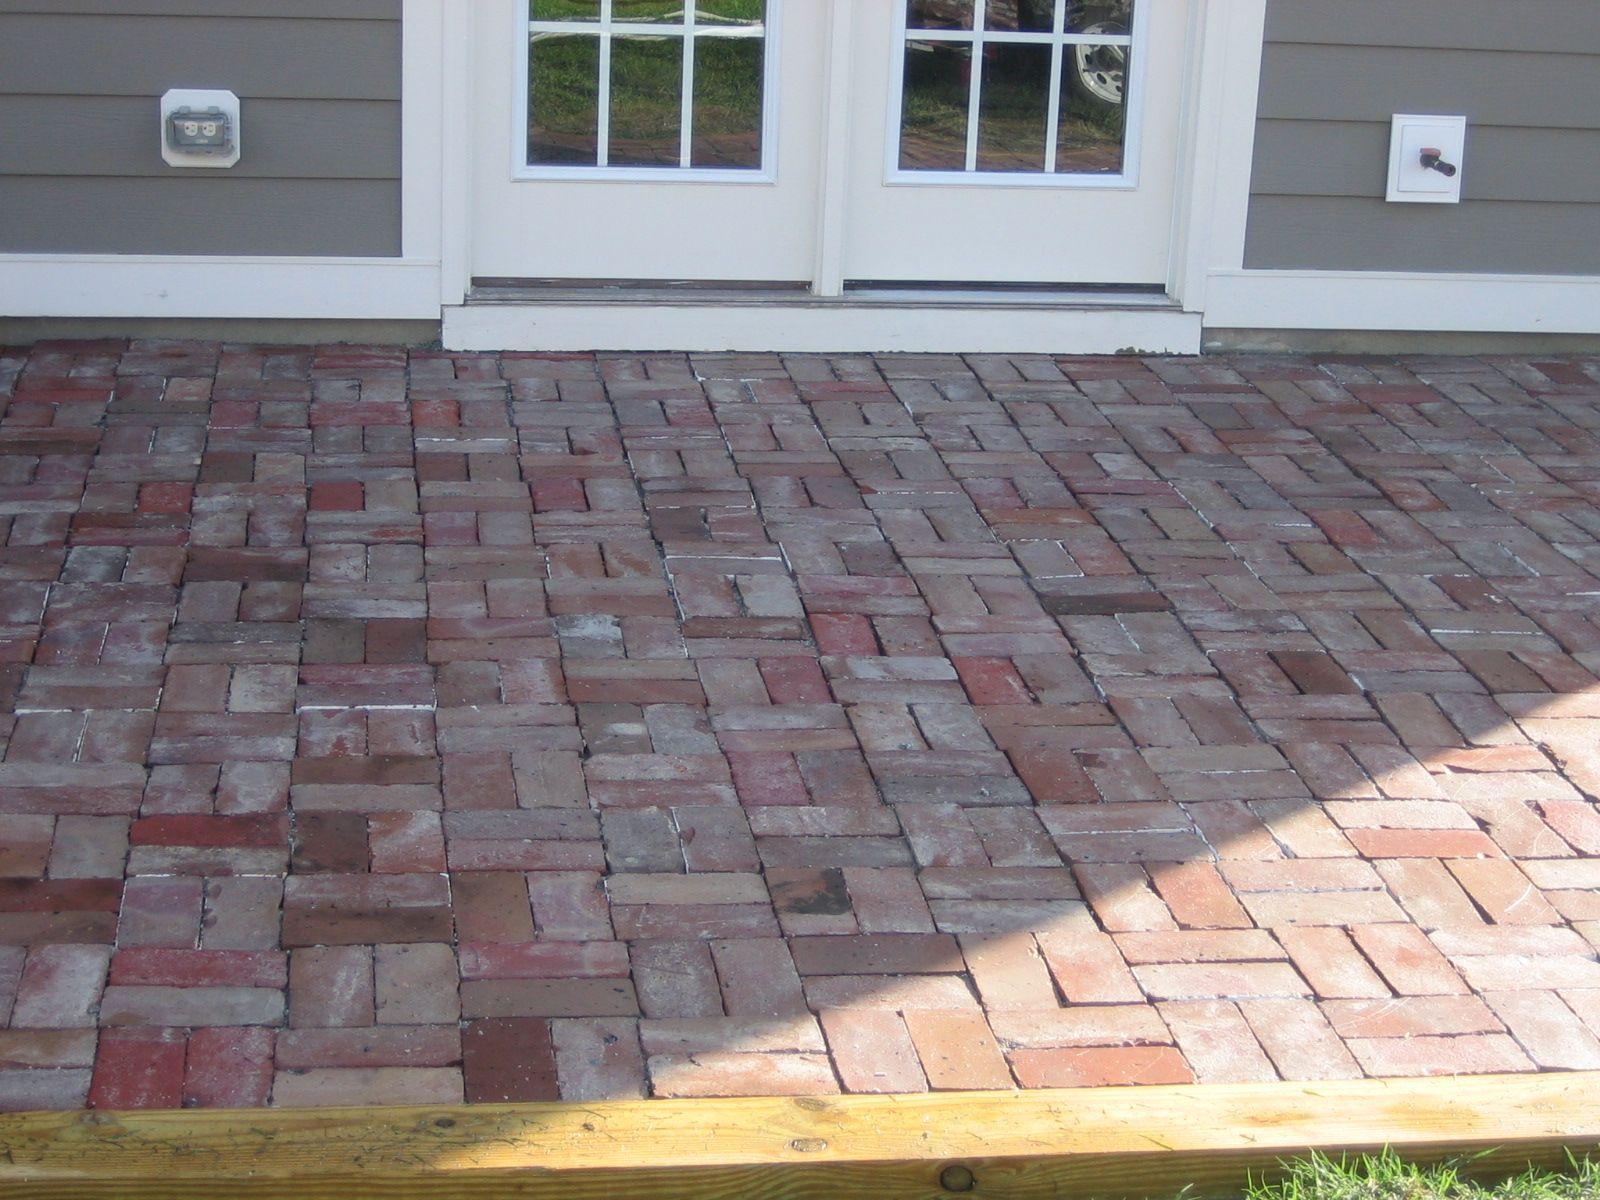 Goodbye Concrete Hello Reclaimed Brick Patio Concrete Patio Reclaimed Brick Patio Brick Patios